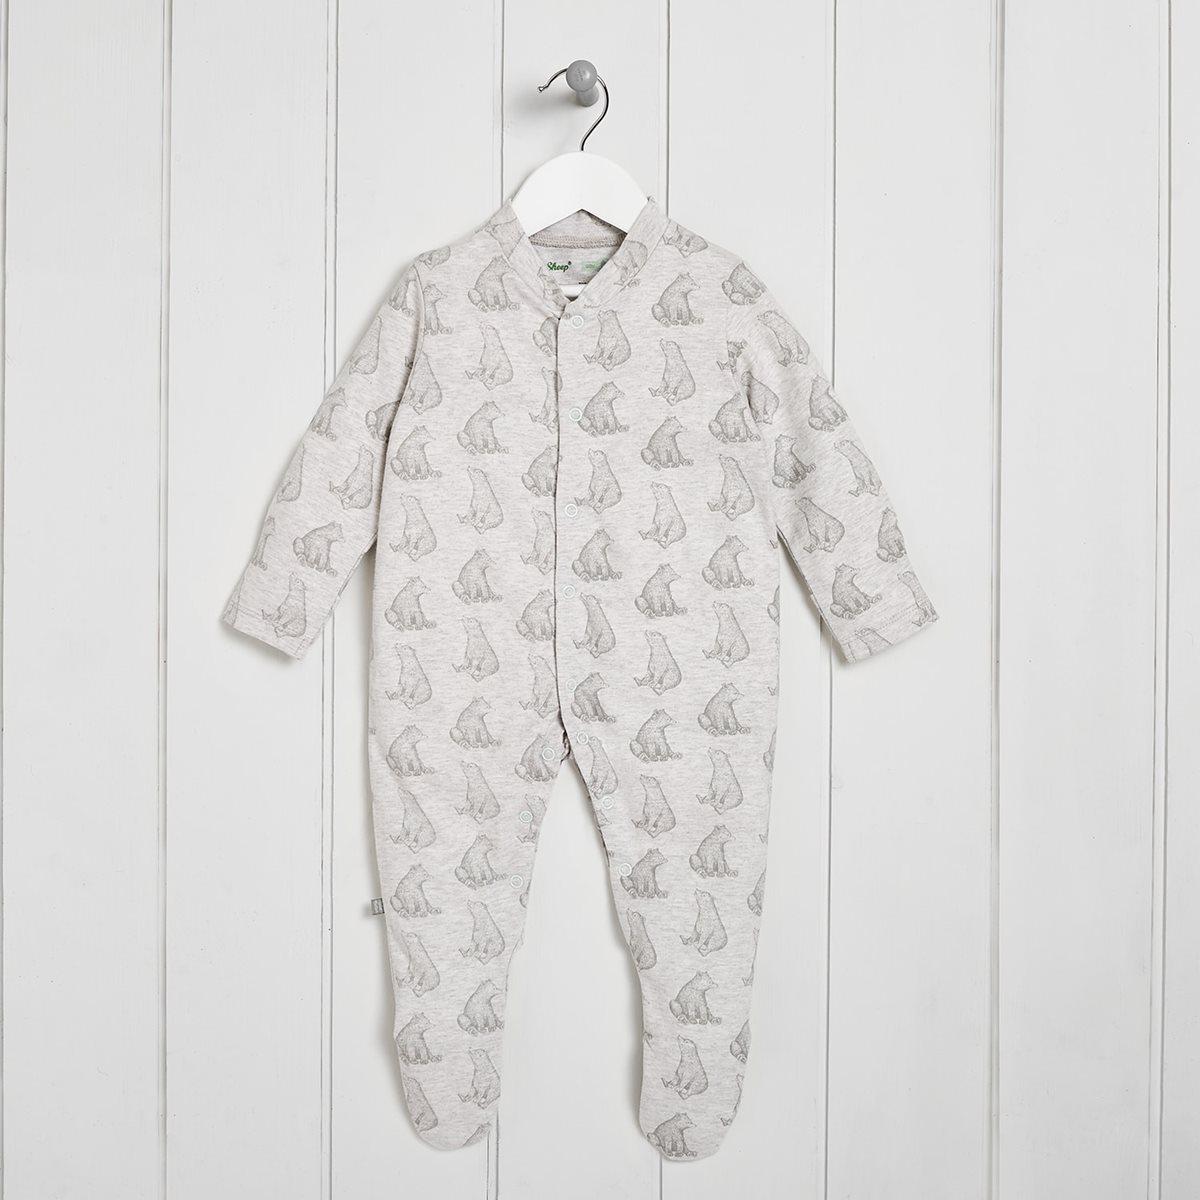 100 Organic Baby Sleepsuit With Bear Print